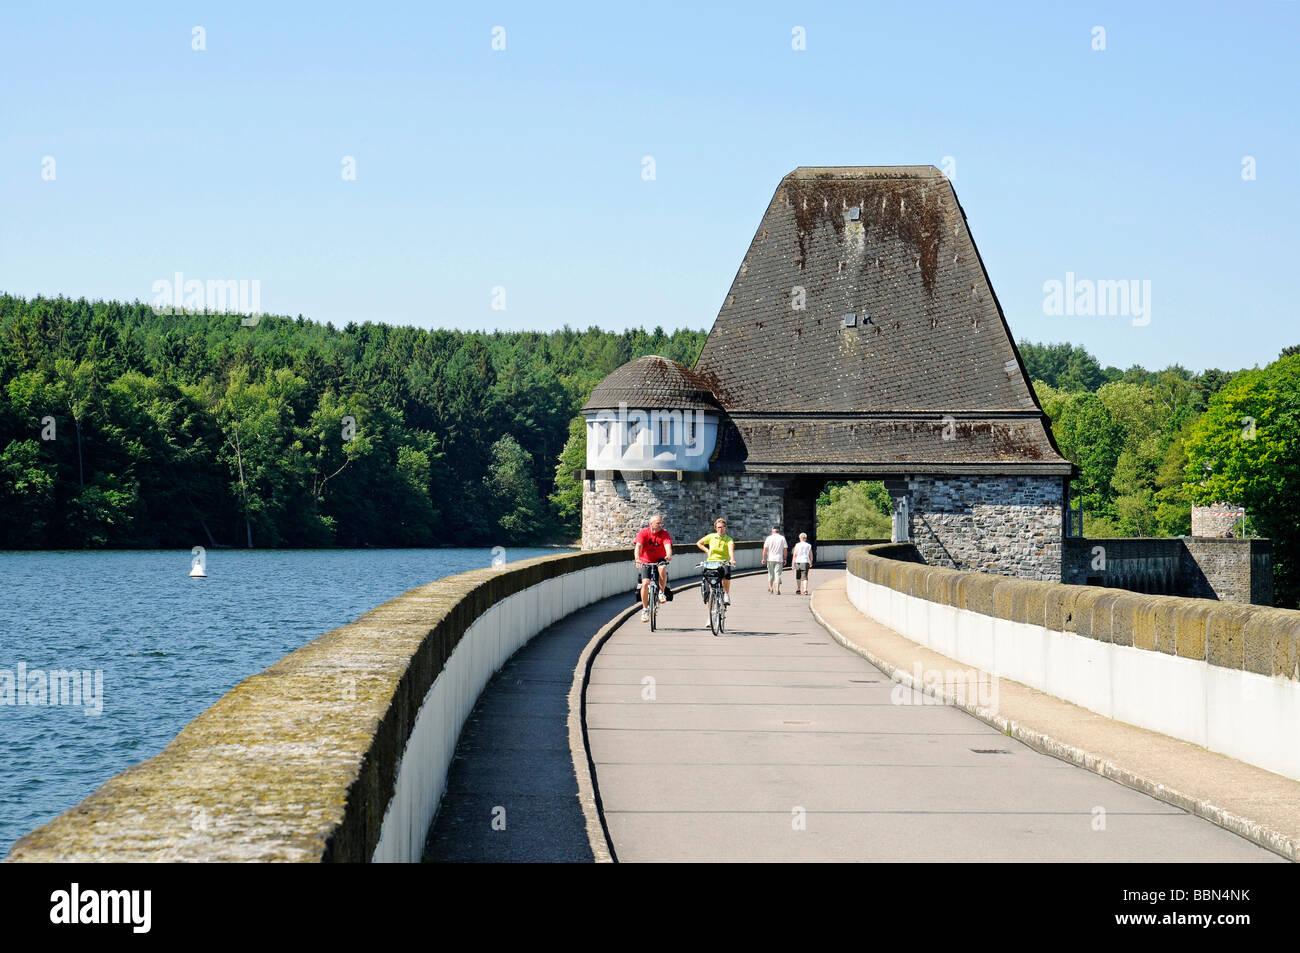 Dam, people, cyclists, recreational sports, Moehnesee lake, Moehne, reservoir, dam, North Rhine-Westphalia, Germany, Stock Photo